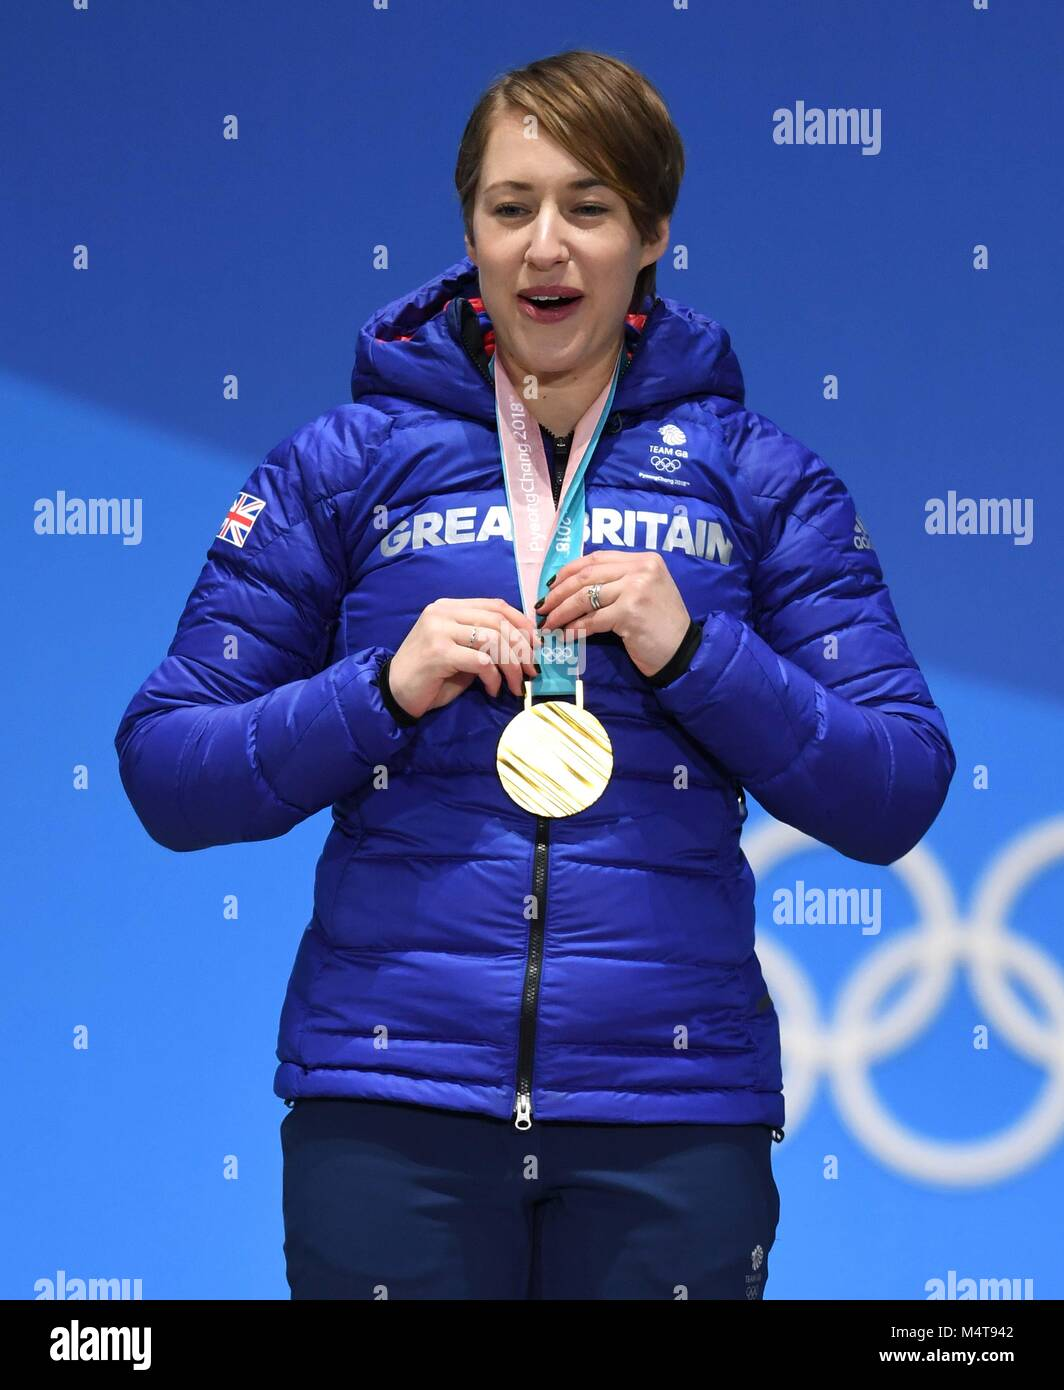 Watch Lyubov Yegorova 9 Olympic medals video